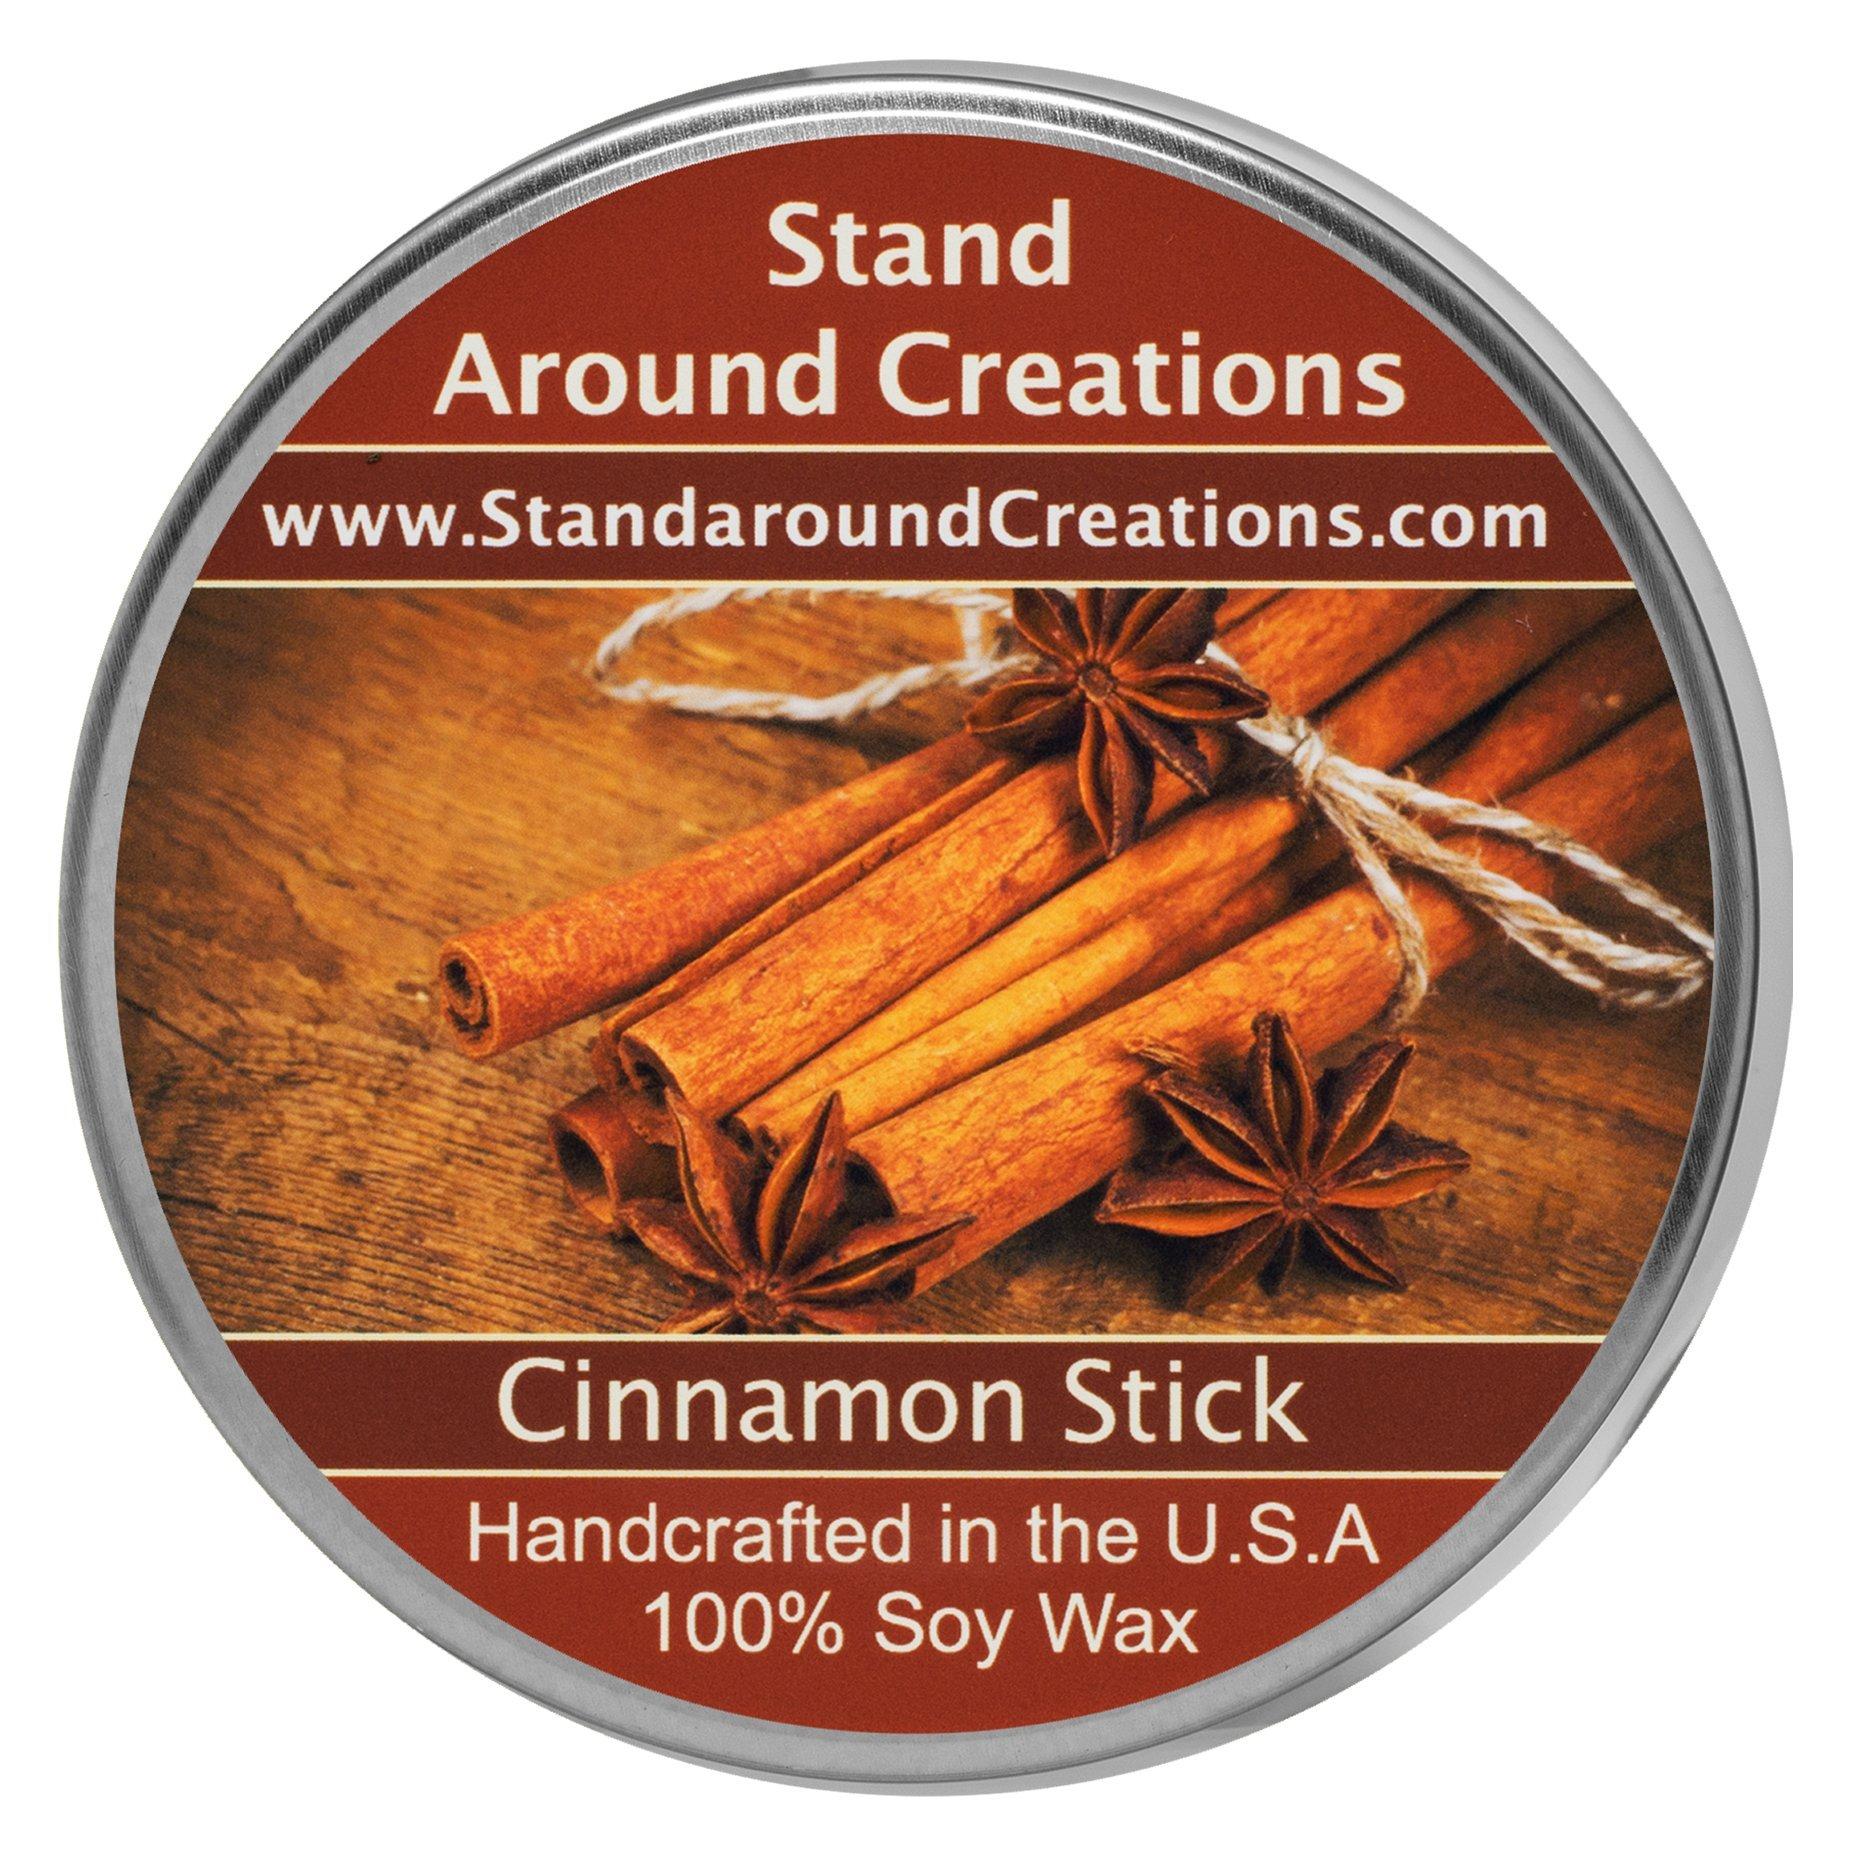 Premium 100% Soy Tureen Candle - 8 oz. -Cinnamon Stick: A full bodied scent of rich spicy cinnamon. Made w/ natural essential oils, Cinnamon, Clove, Cinnamon Bark.